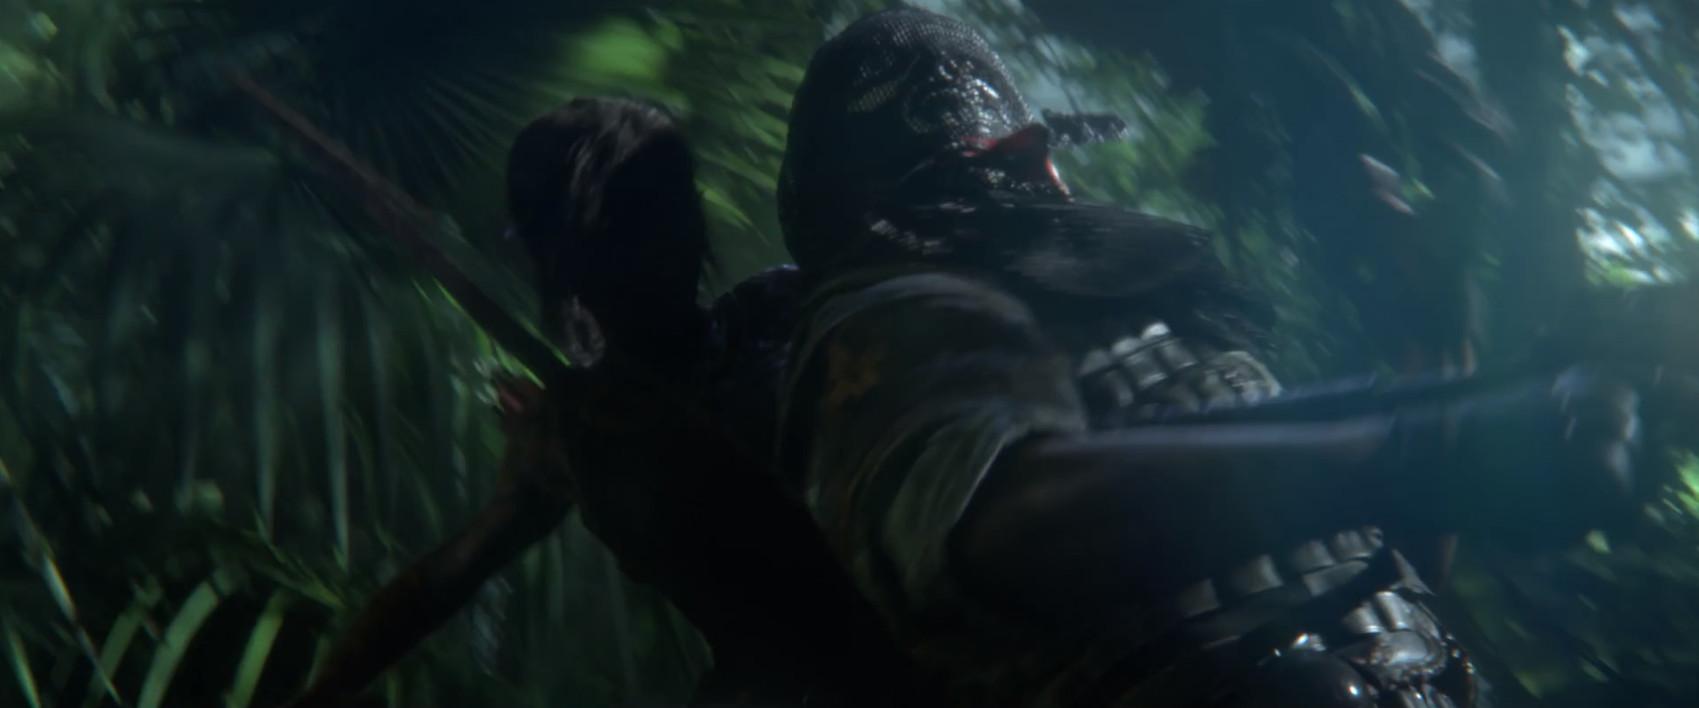 shadow-tomb-raider-end-of-beginning-trailer13